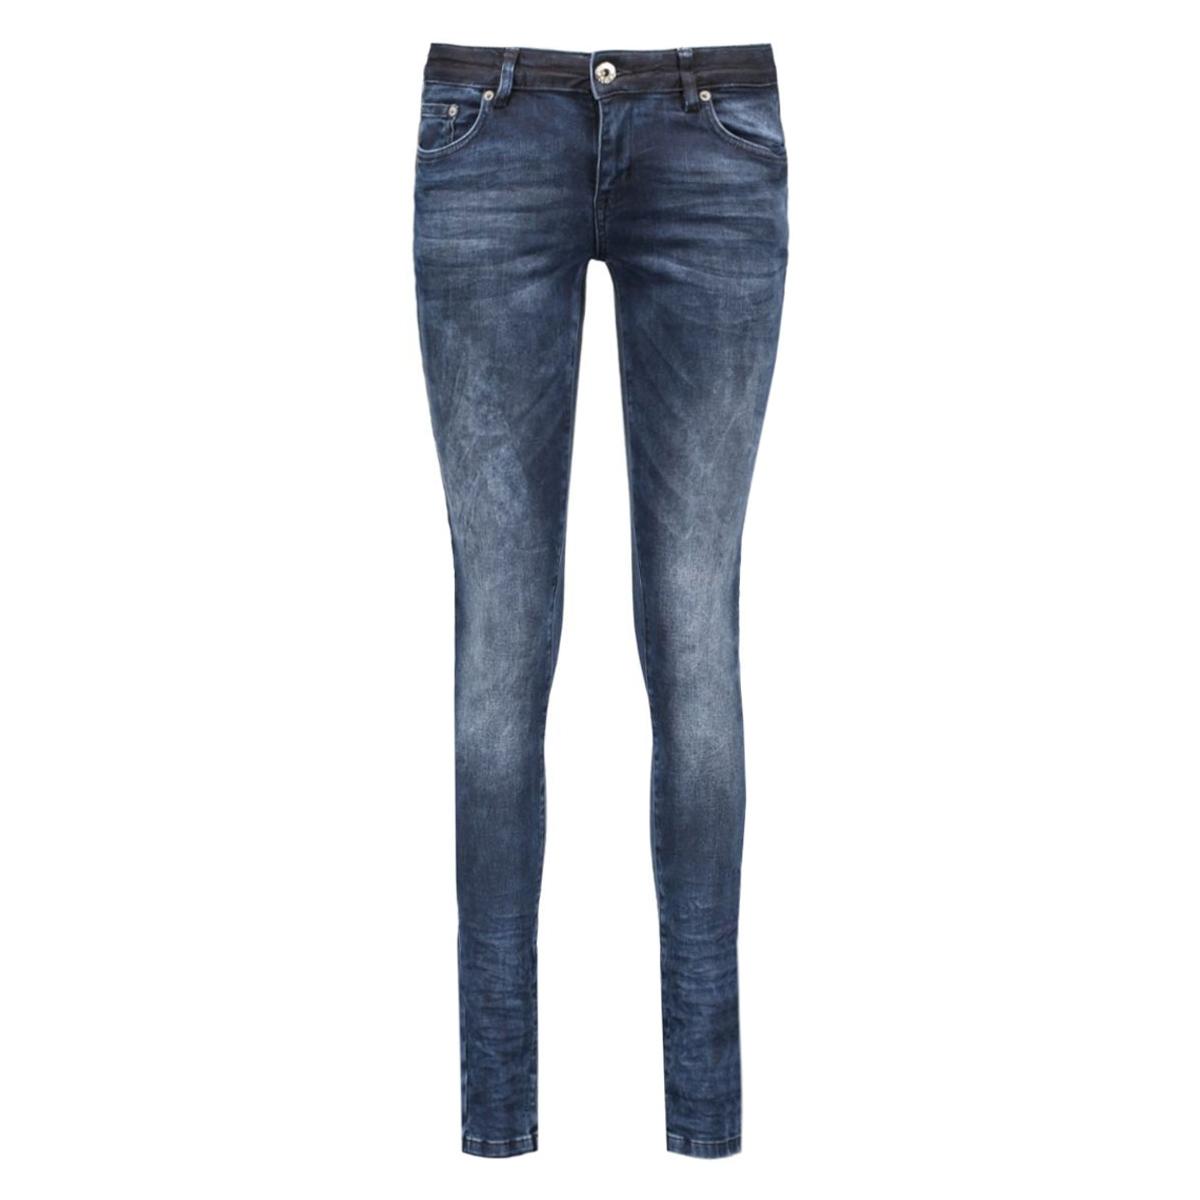 w16.14.6287 poppy circle of trust jeans blue black wash